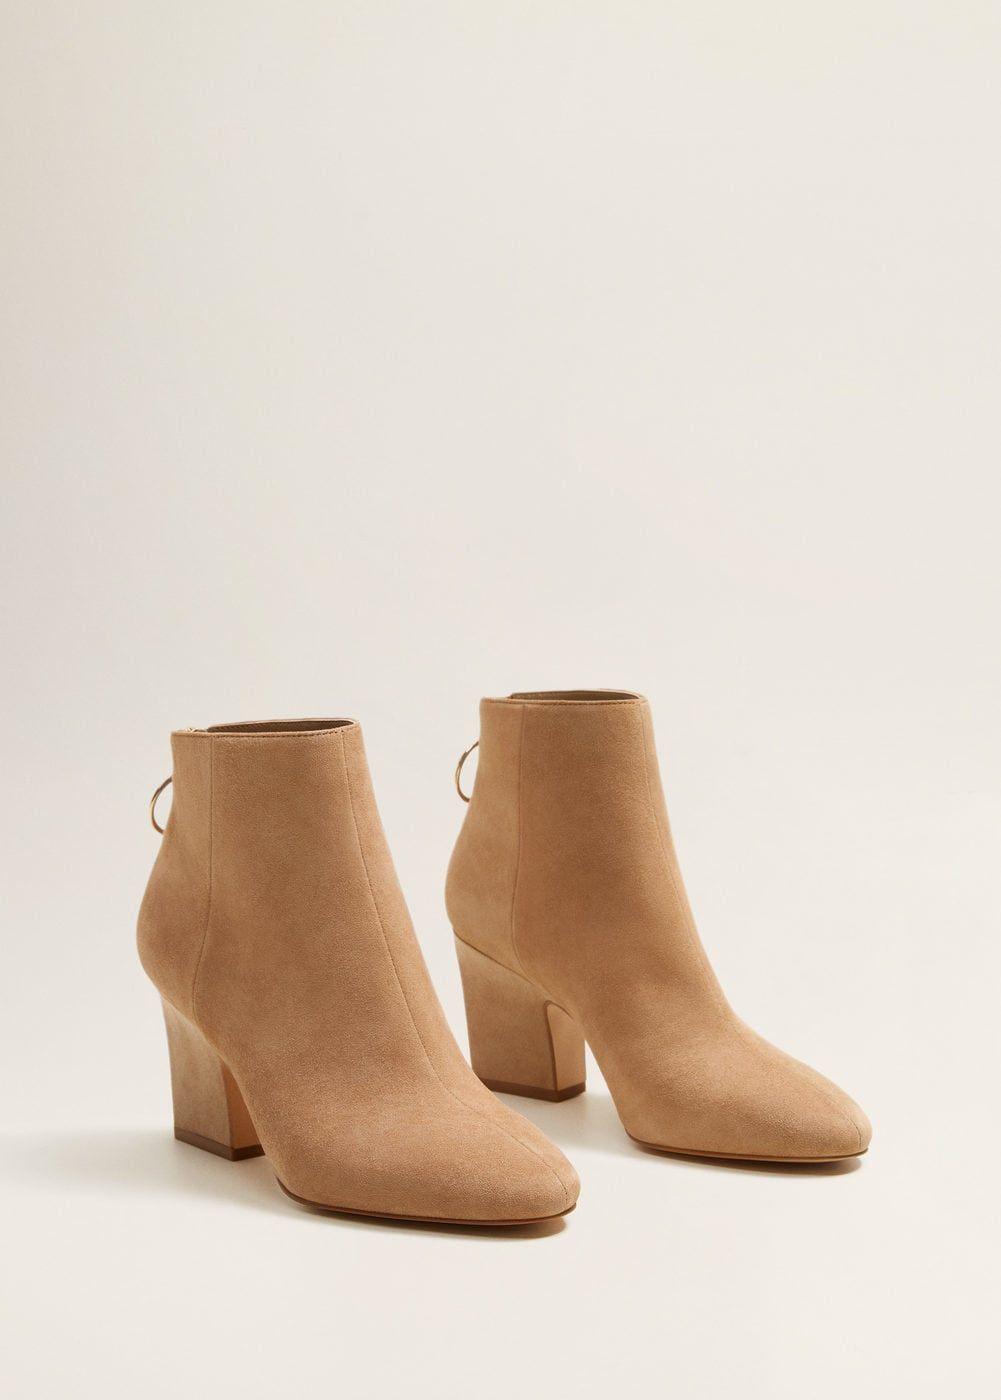 Kozhanye Botinki S Molniej Zhenskaya Mango Mango Rossiya Rossijskaya Federaciya Boots Womens Boots Ankle High Boots Outfit